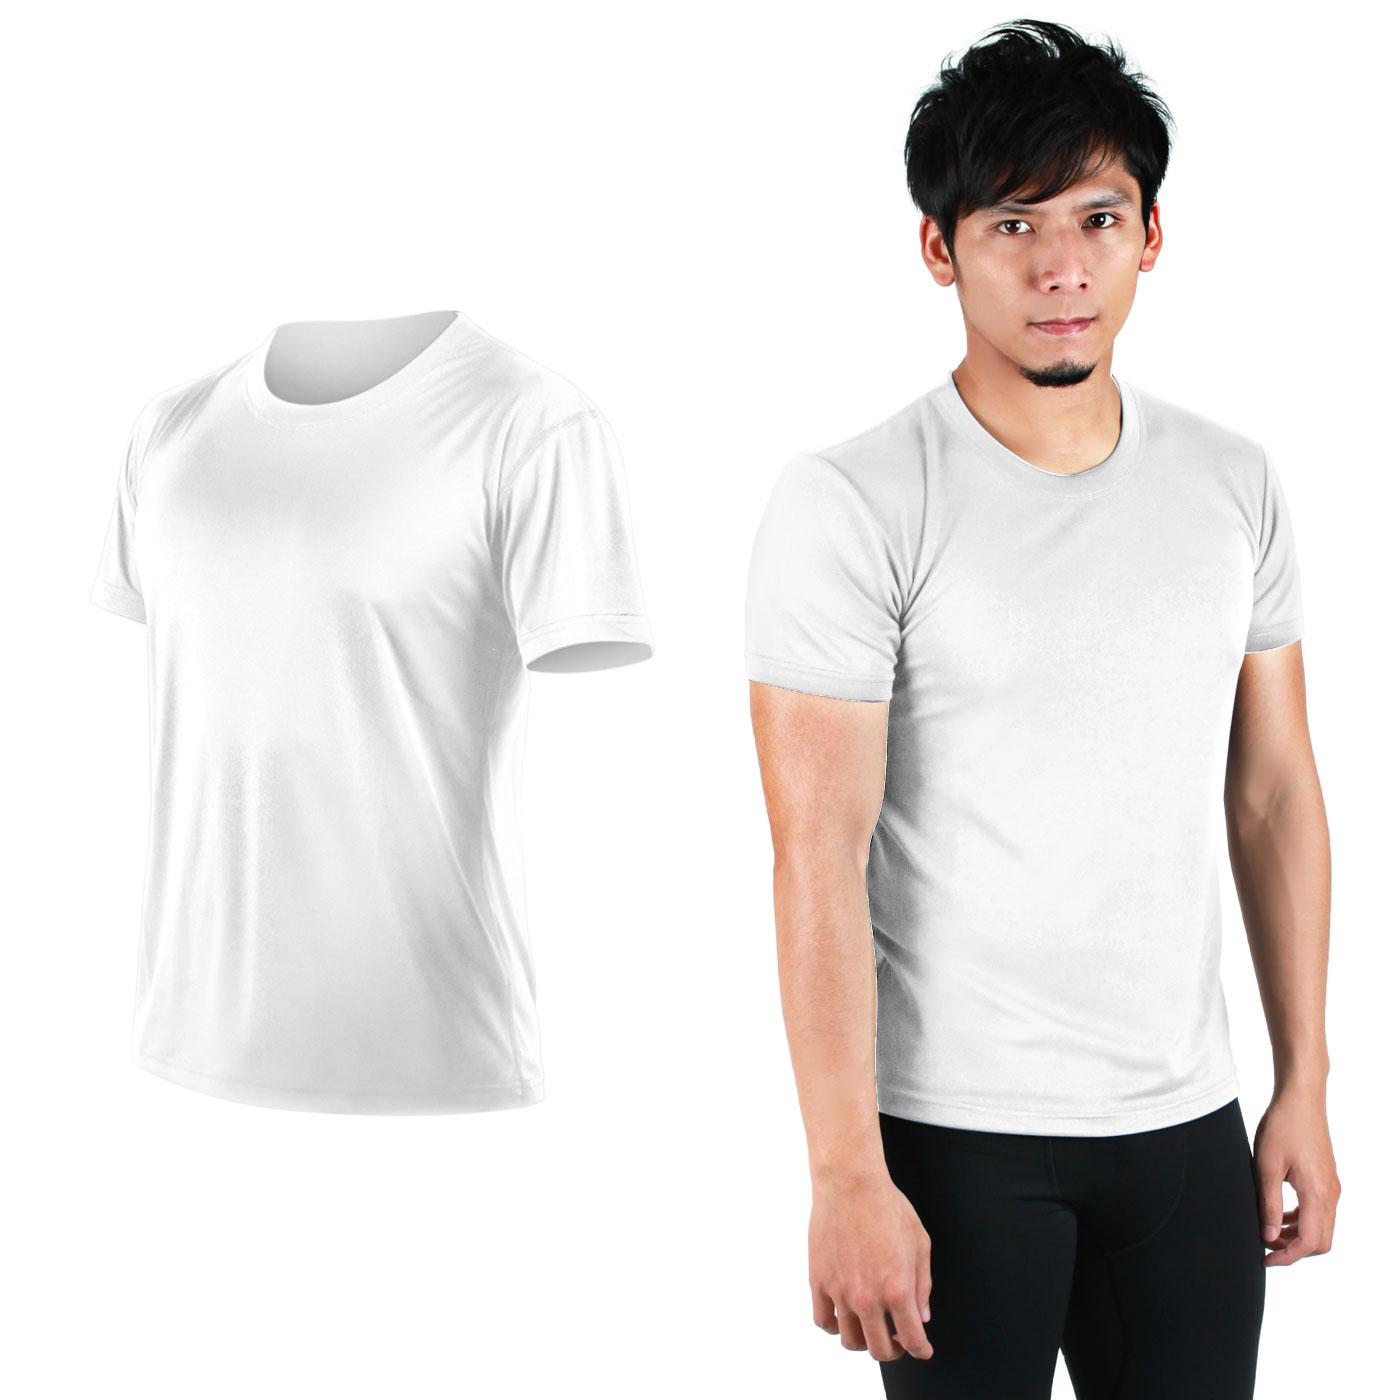 HODARLA FLARE 100 吸濕排汗衫3108301 - 白